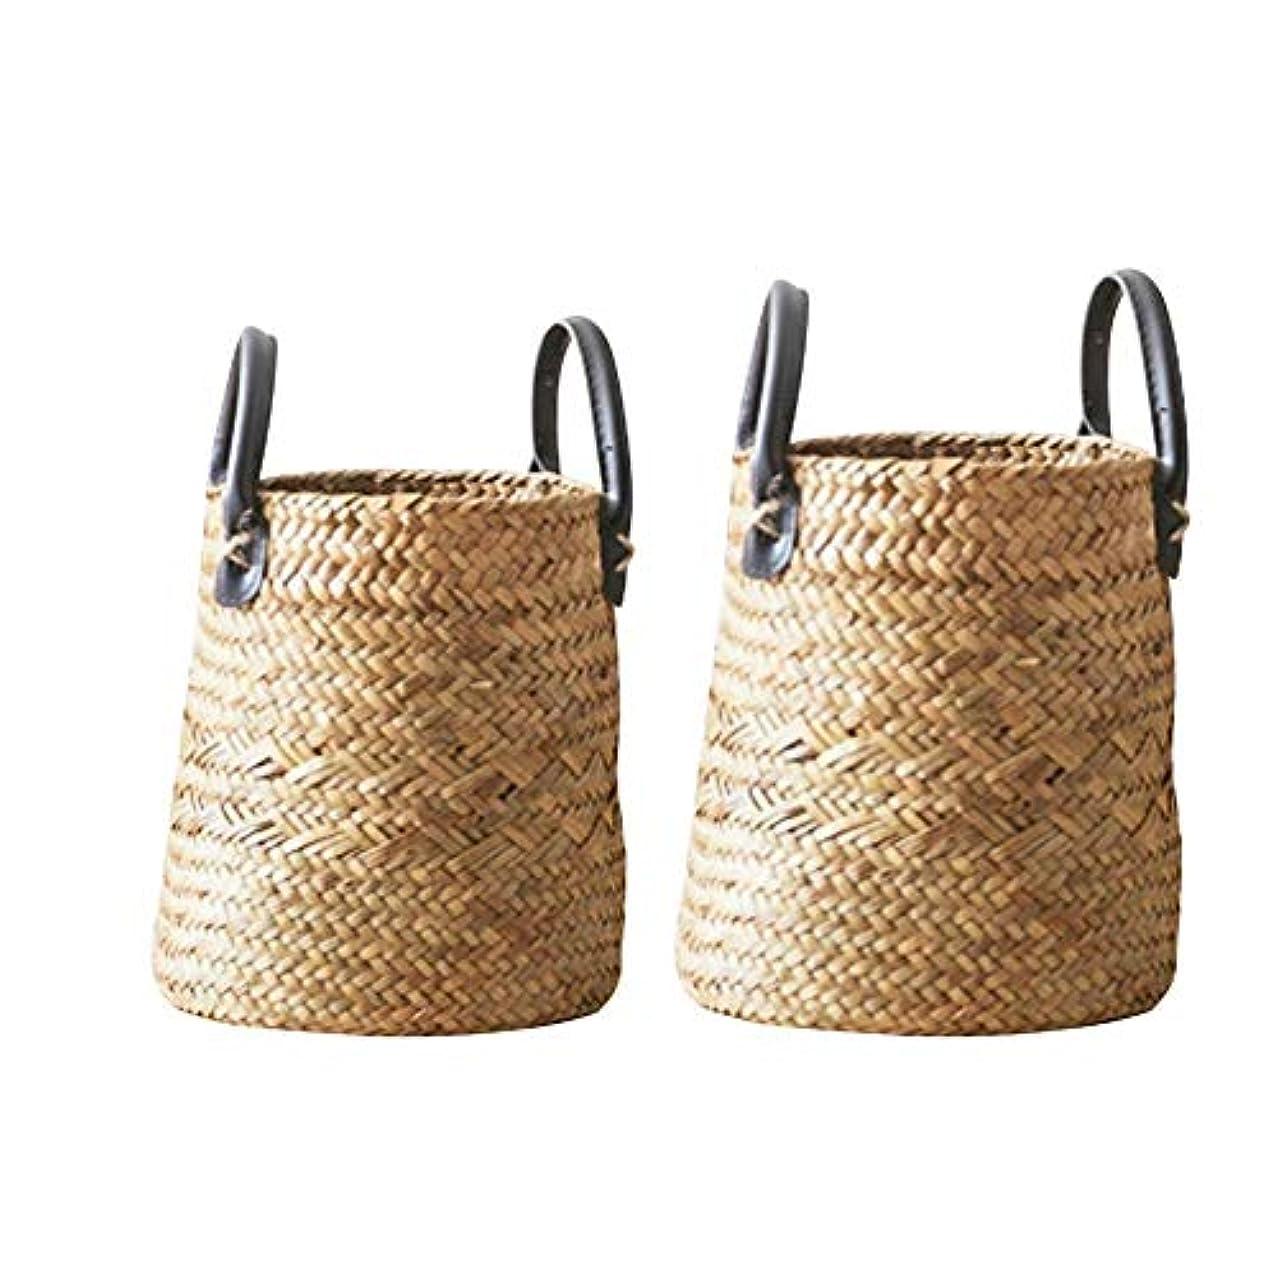 Splendidsun 2PCS/Set Hand-Woven Straw Dry Flower Storage Basket - Home Decor Organizer Round Shopping Camping Picnic Basket Portable Laundry Basket with Handles - S/M/L